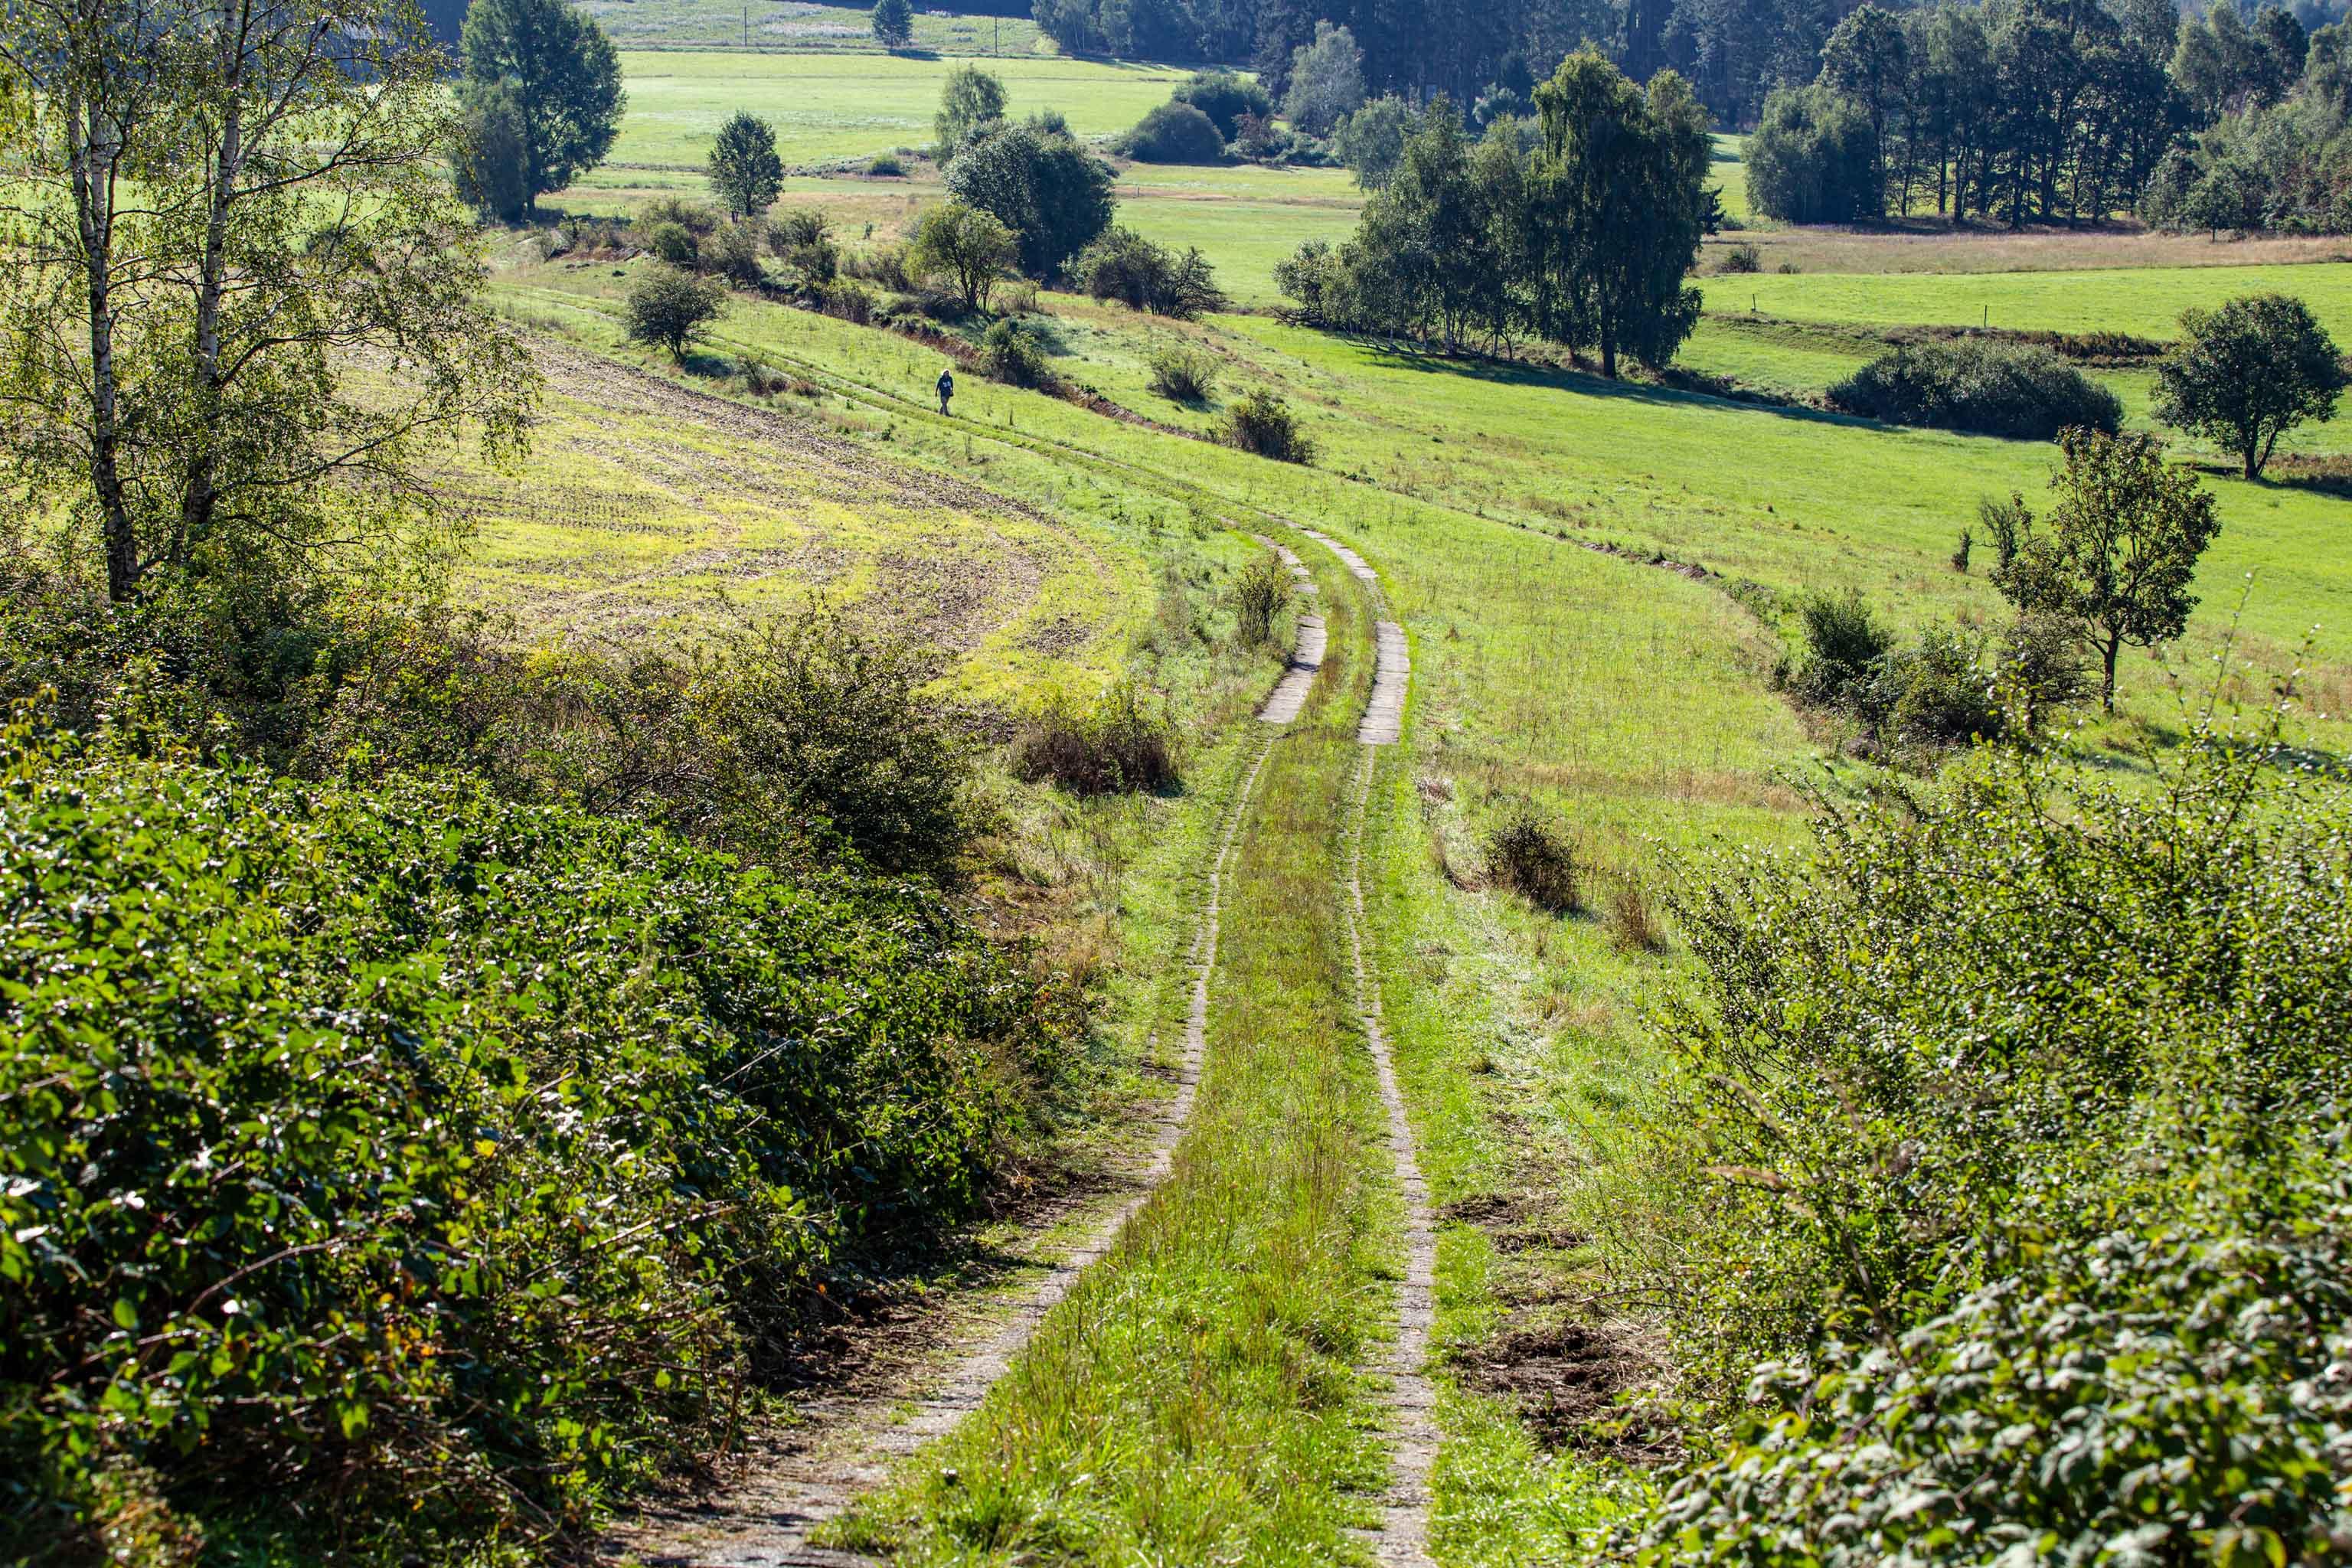 Green Belt, Saxony border - long distance hiking - hiking trails Germany - hiking in Germany - top trails in Germany